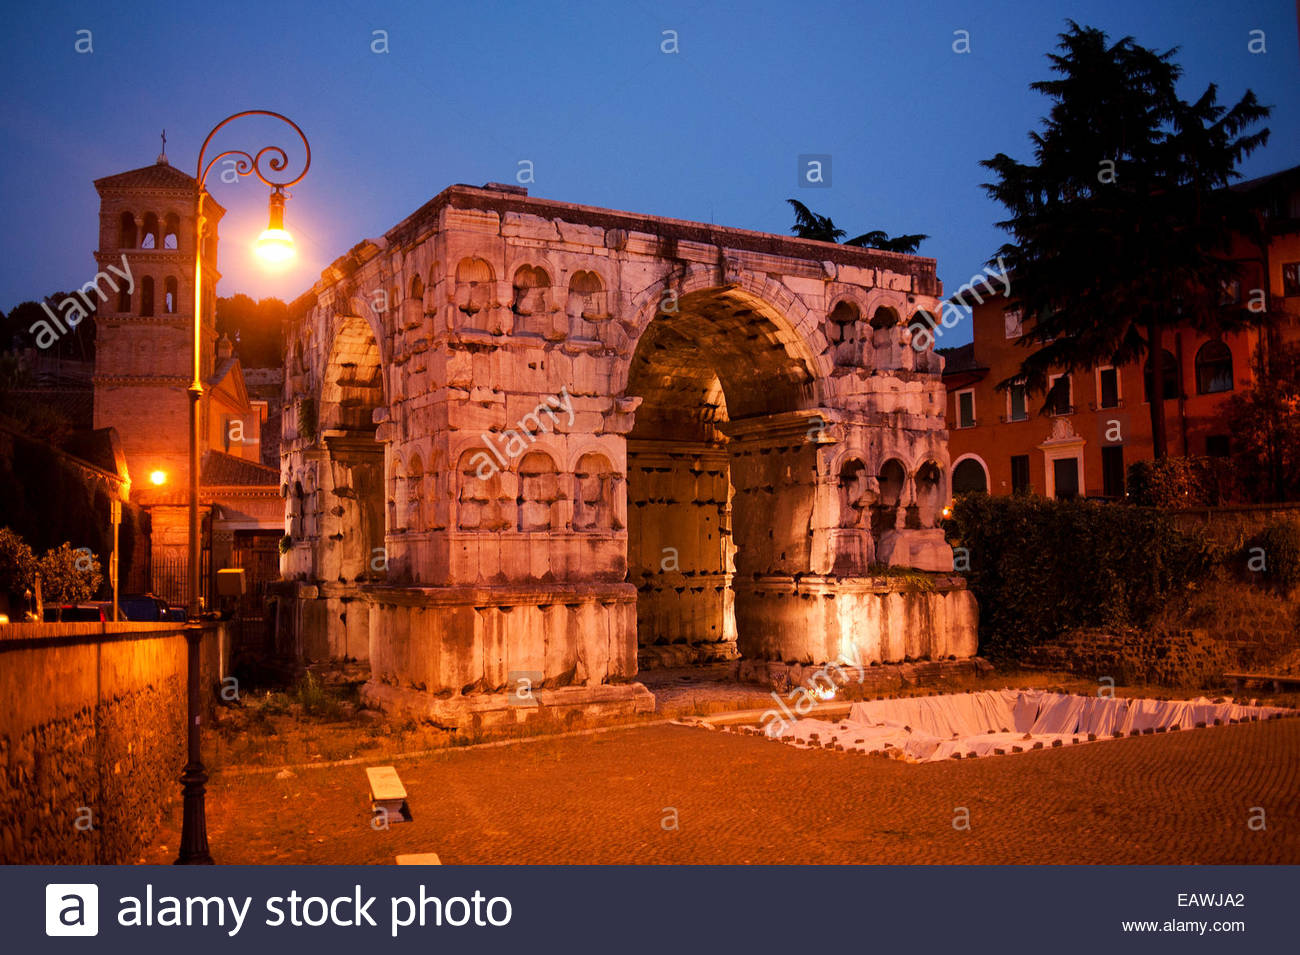 Lights illuminate the Arch of Janus in Rome. - Stock Image